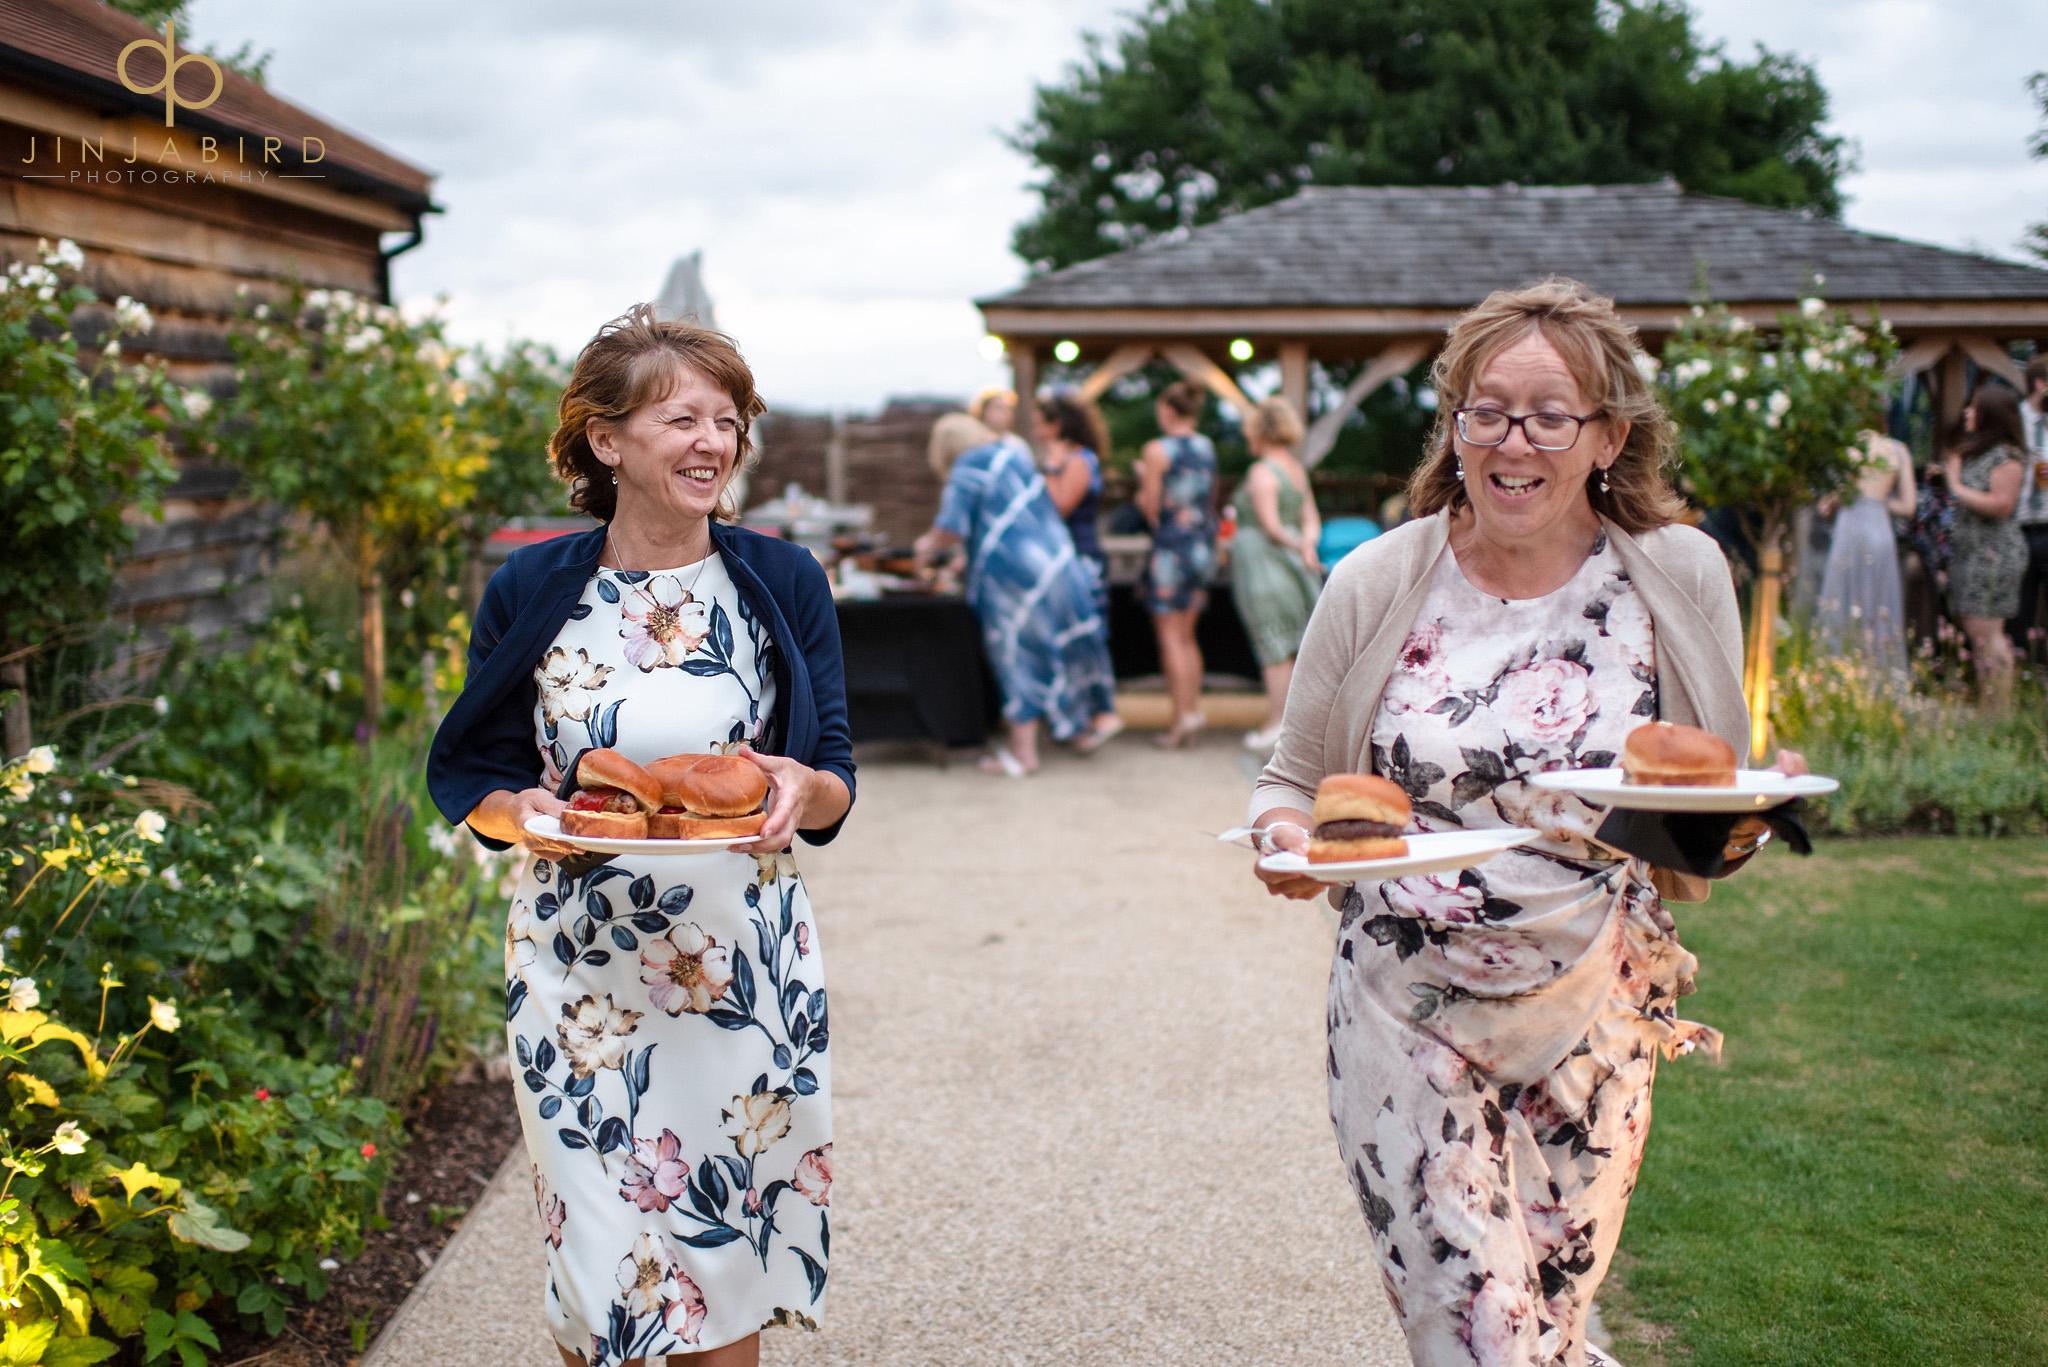 evening wedding food bassmead manor